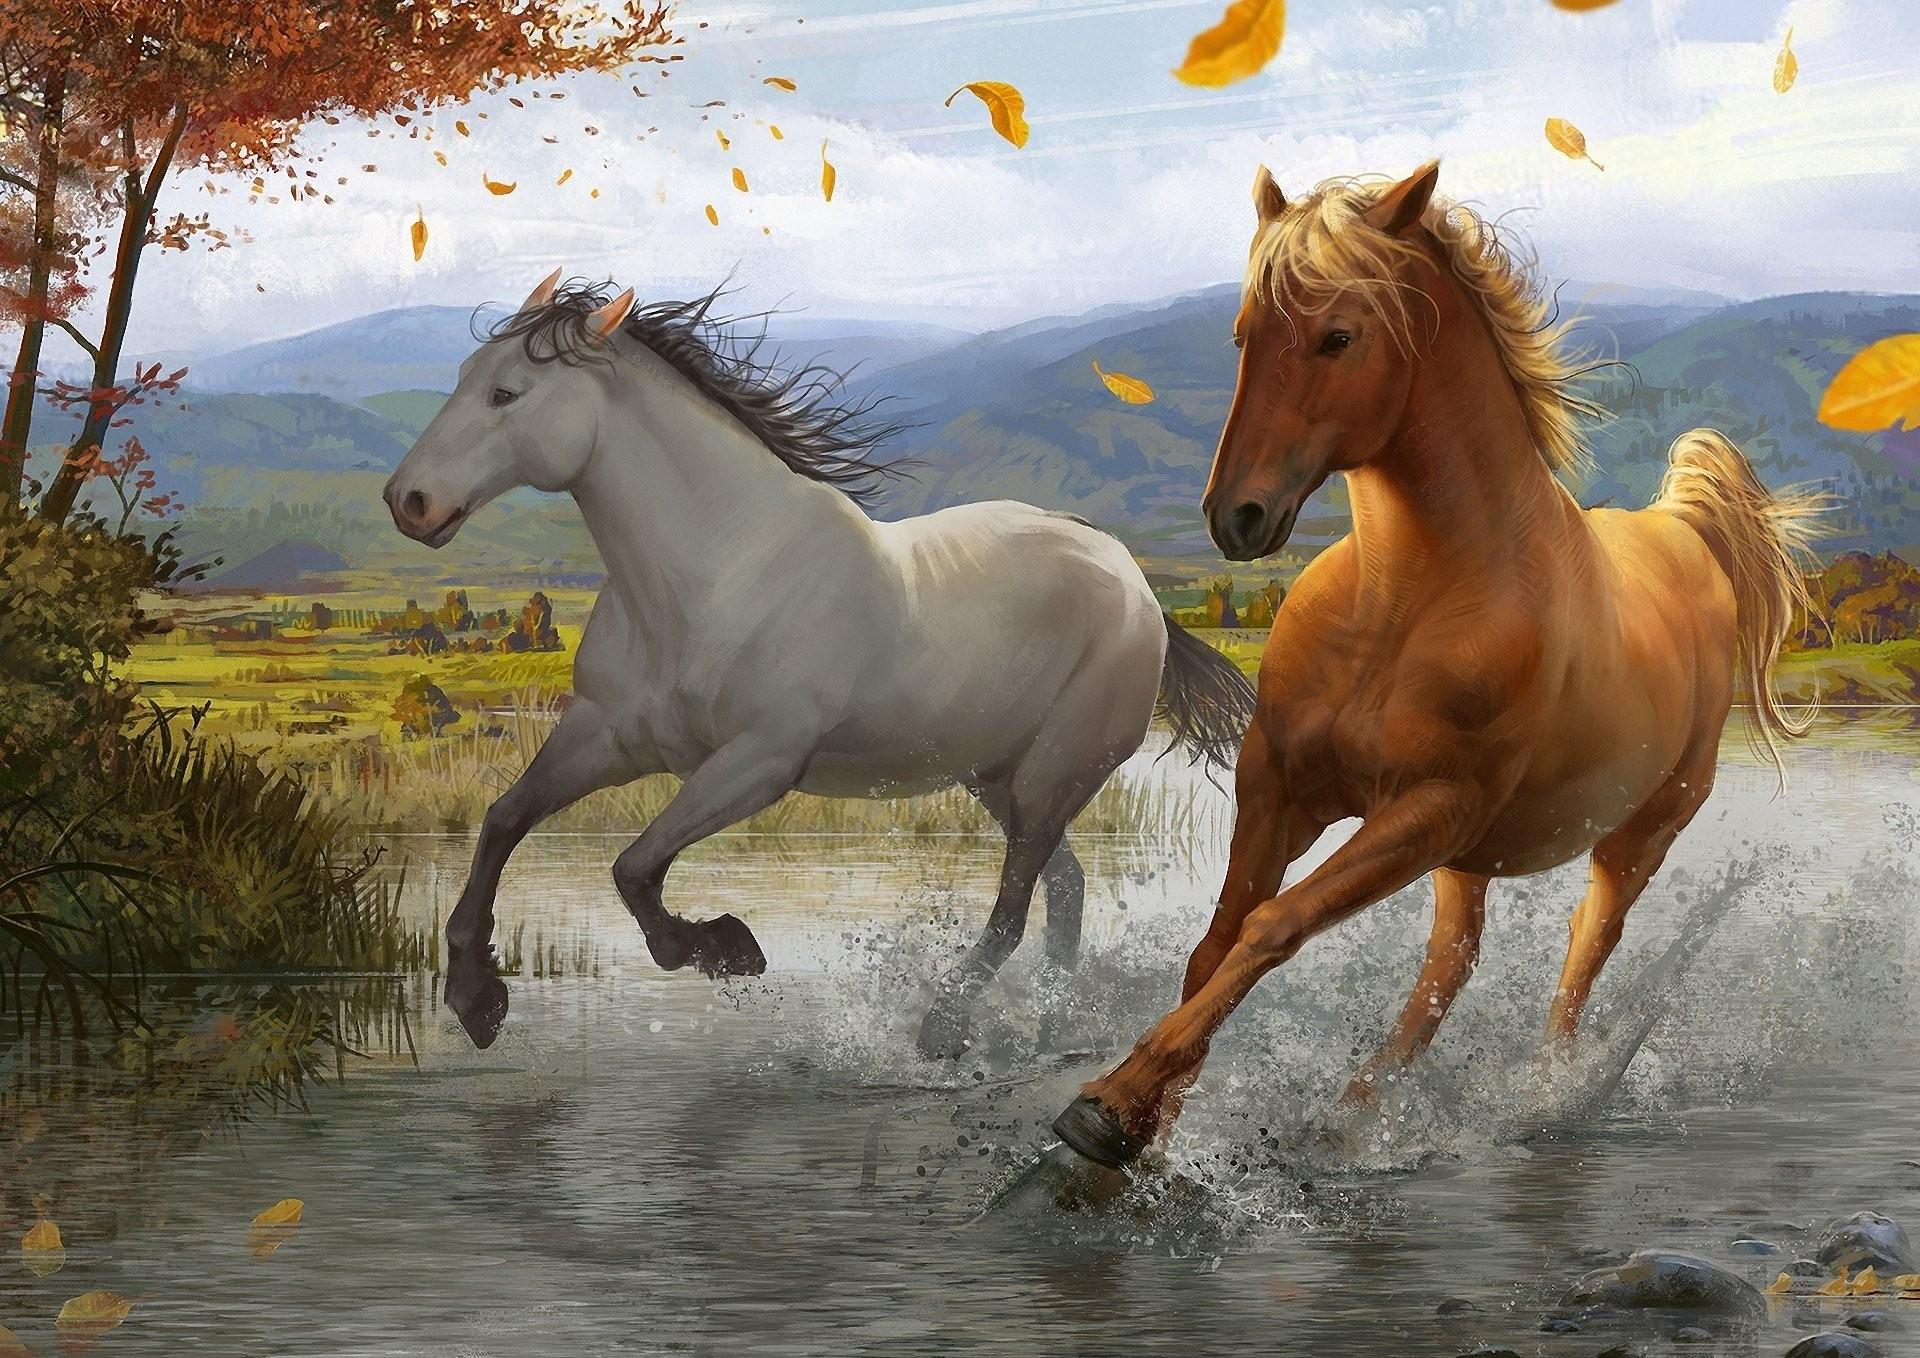 Res: 1920x1358, Foliage Spray Horse Wind River Running Art Tree Christmas Animal Wallpaper  Desktop